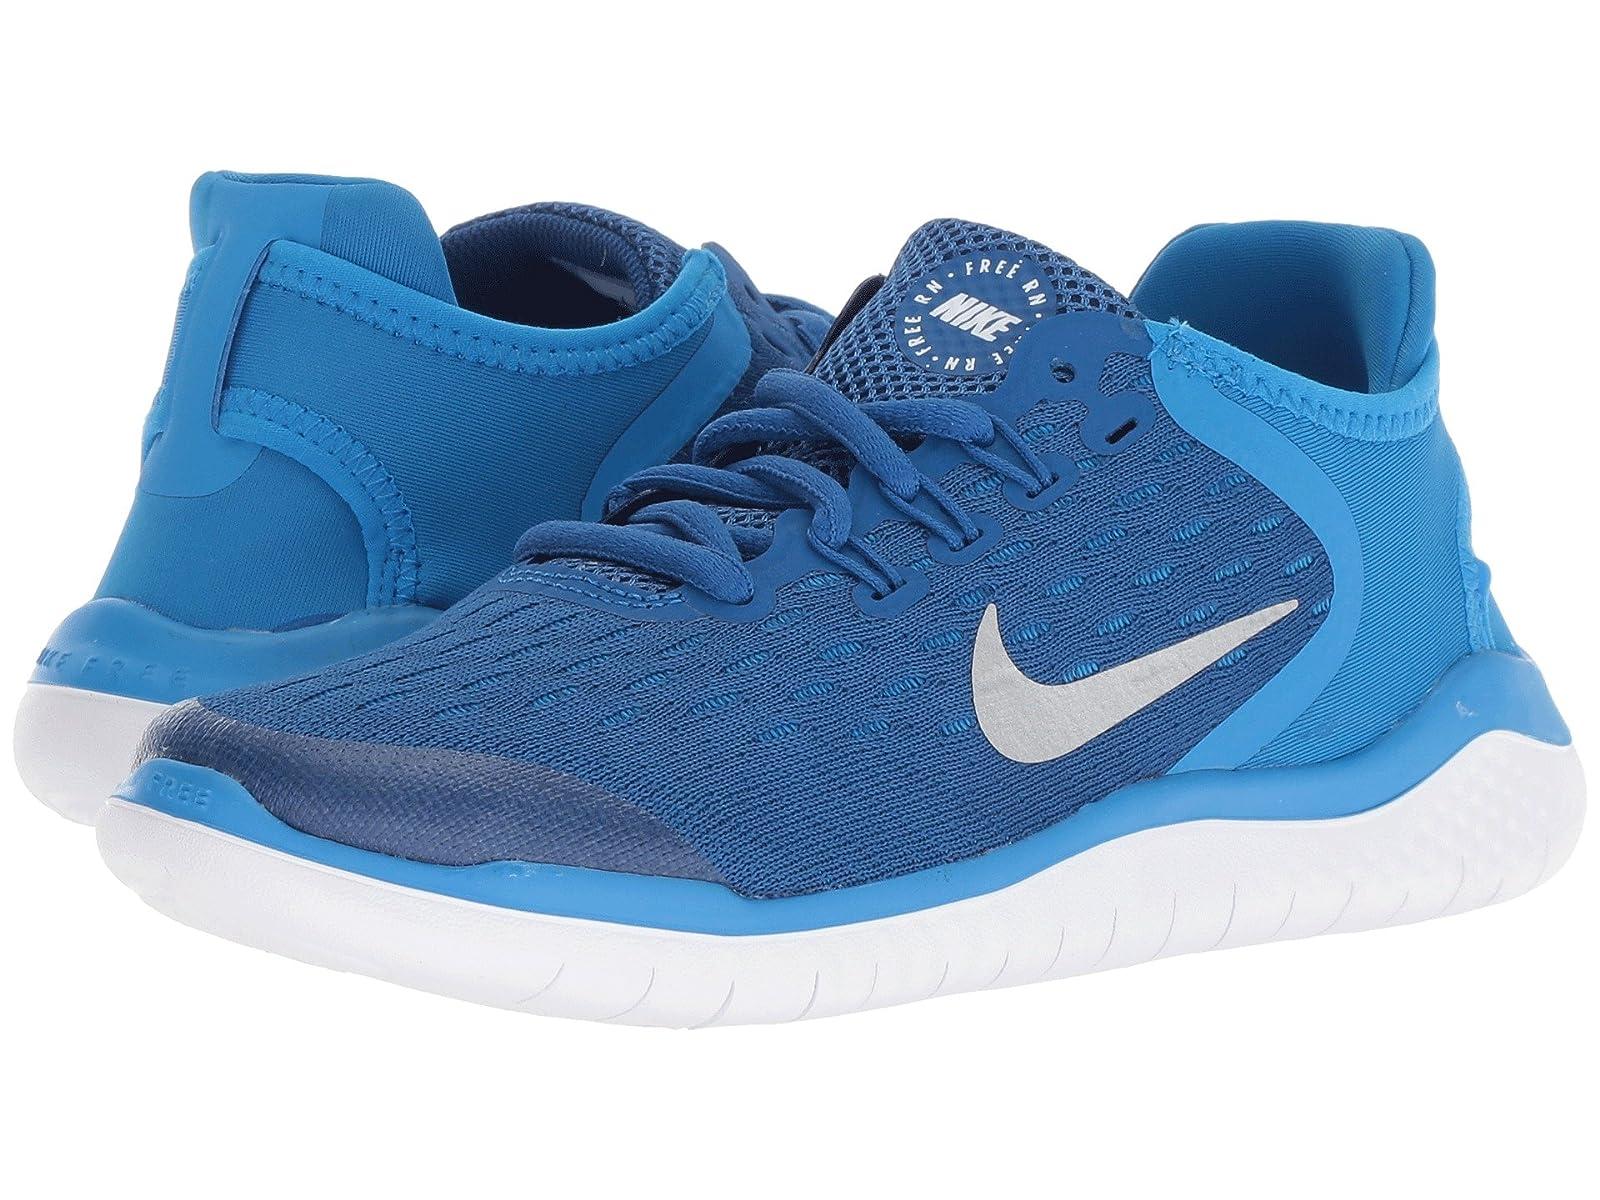 Nike Kids Free RN (Big Kid)Atmospheric grades have affordable shoes